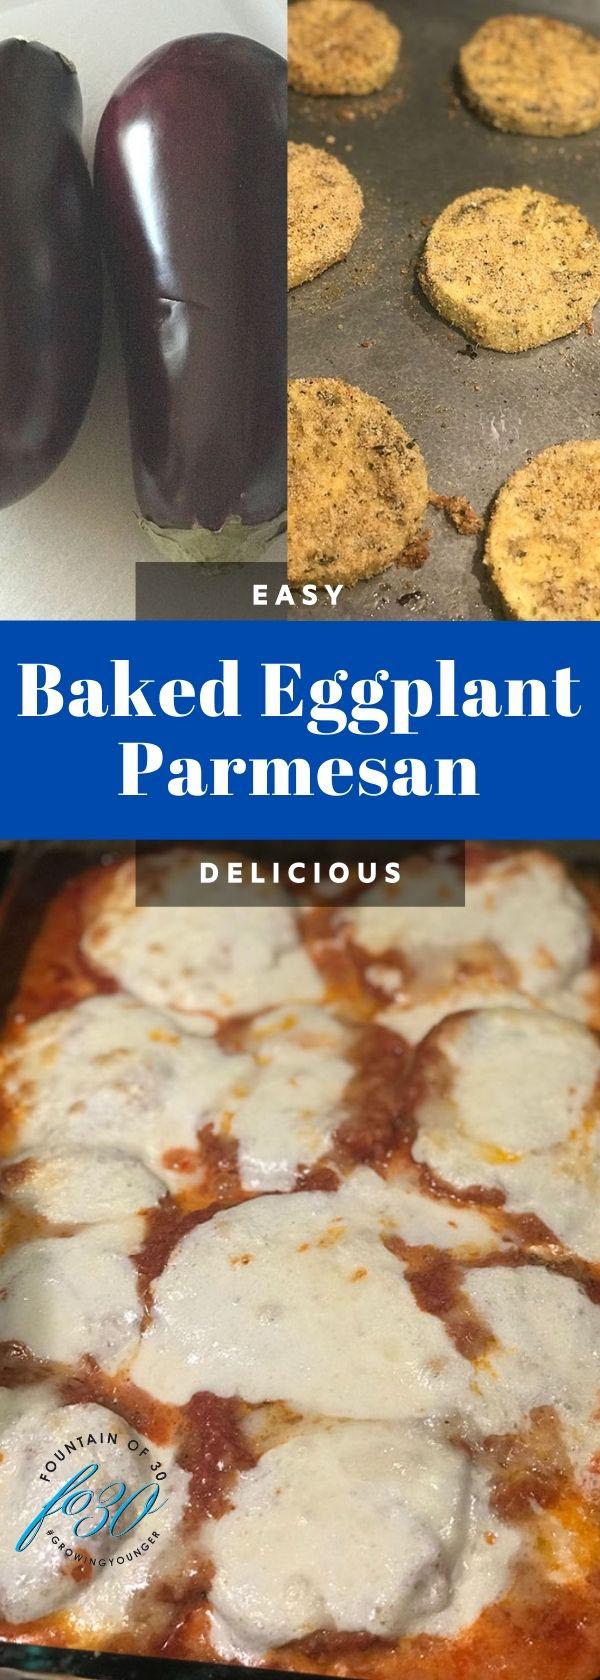 baked eggplant parmesan recipe fountainof30